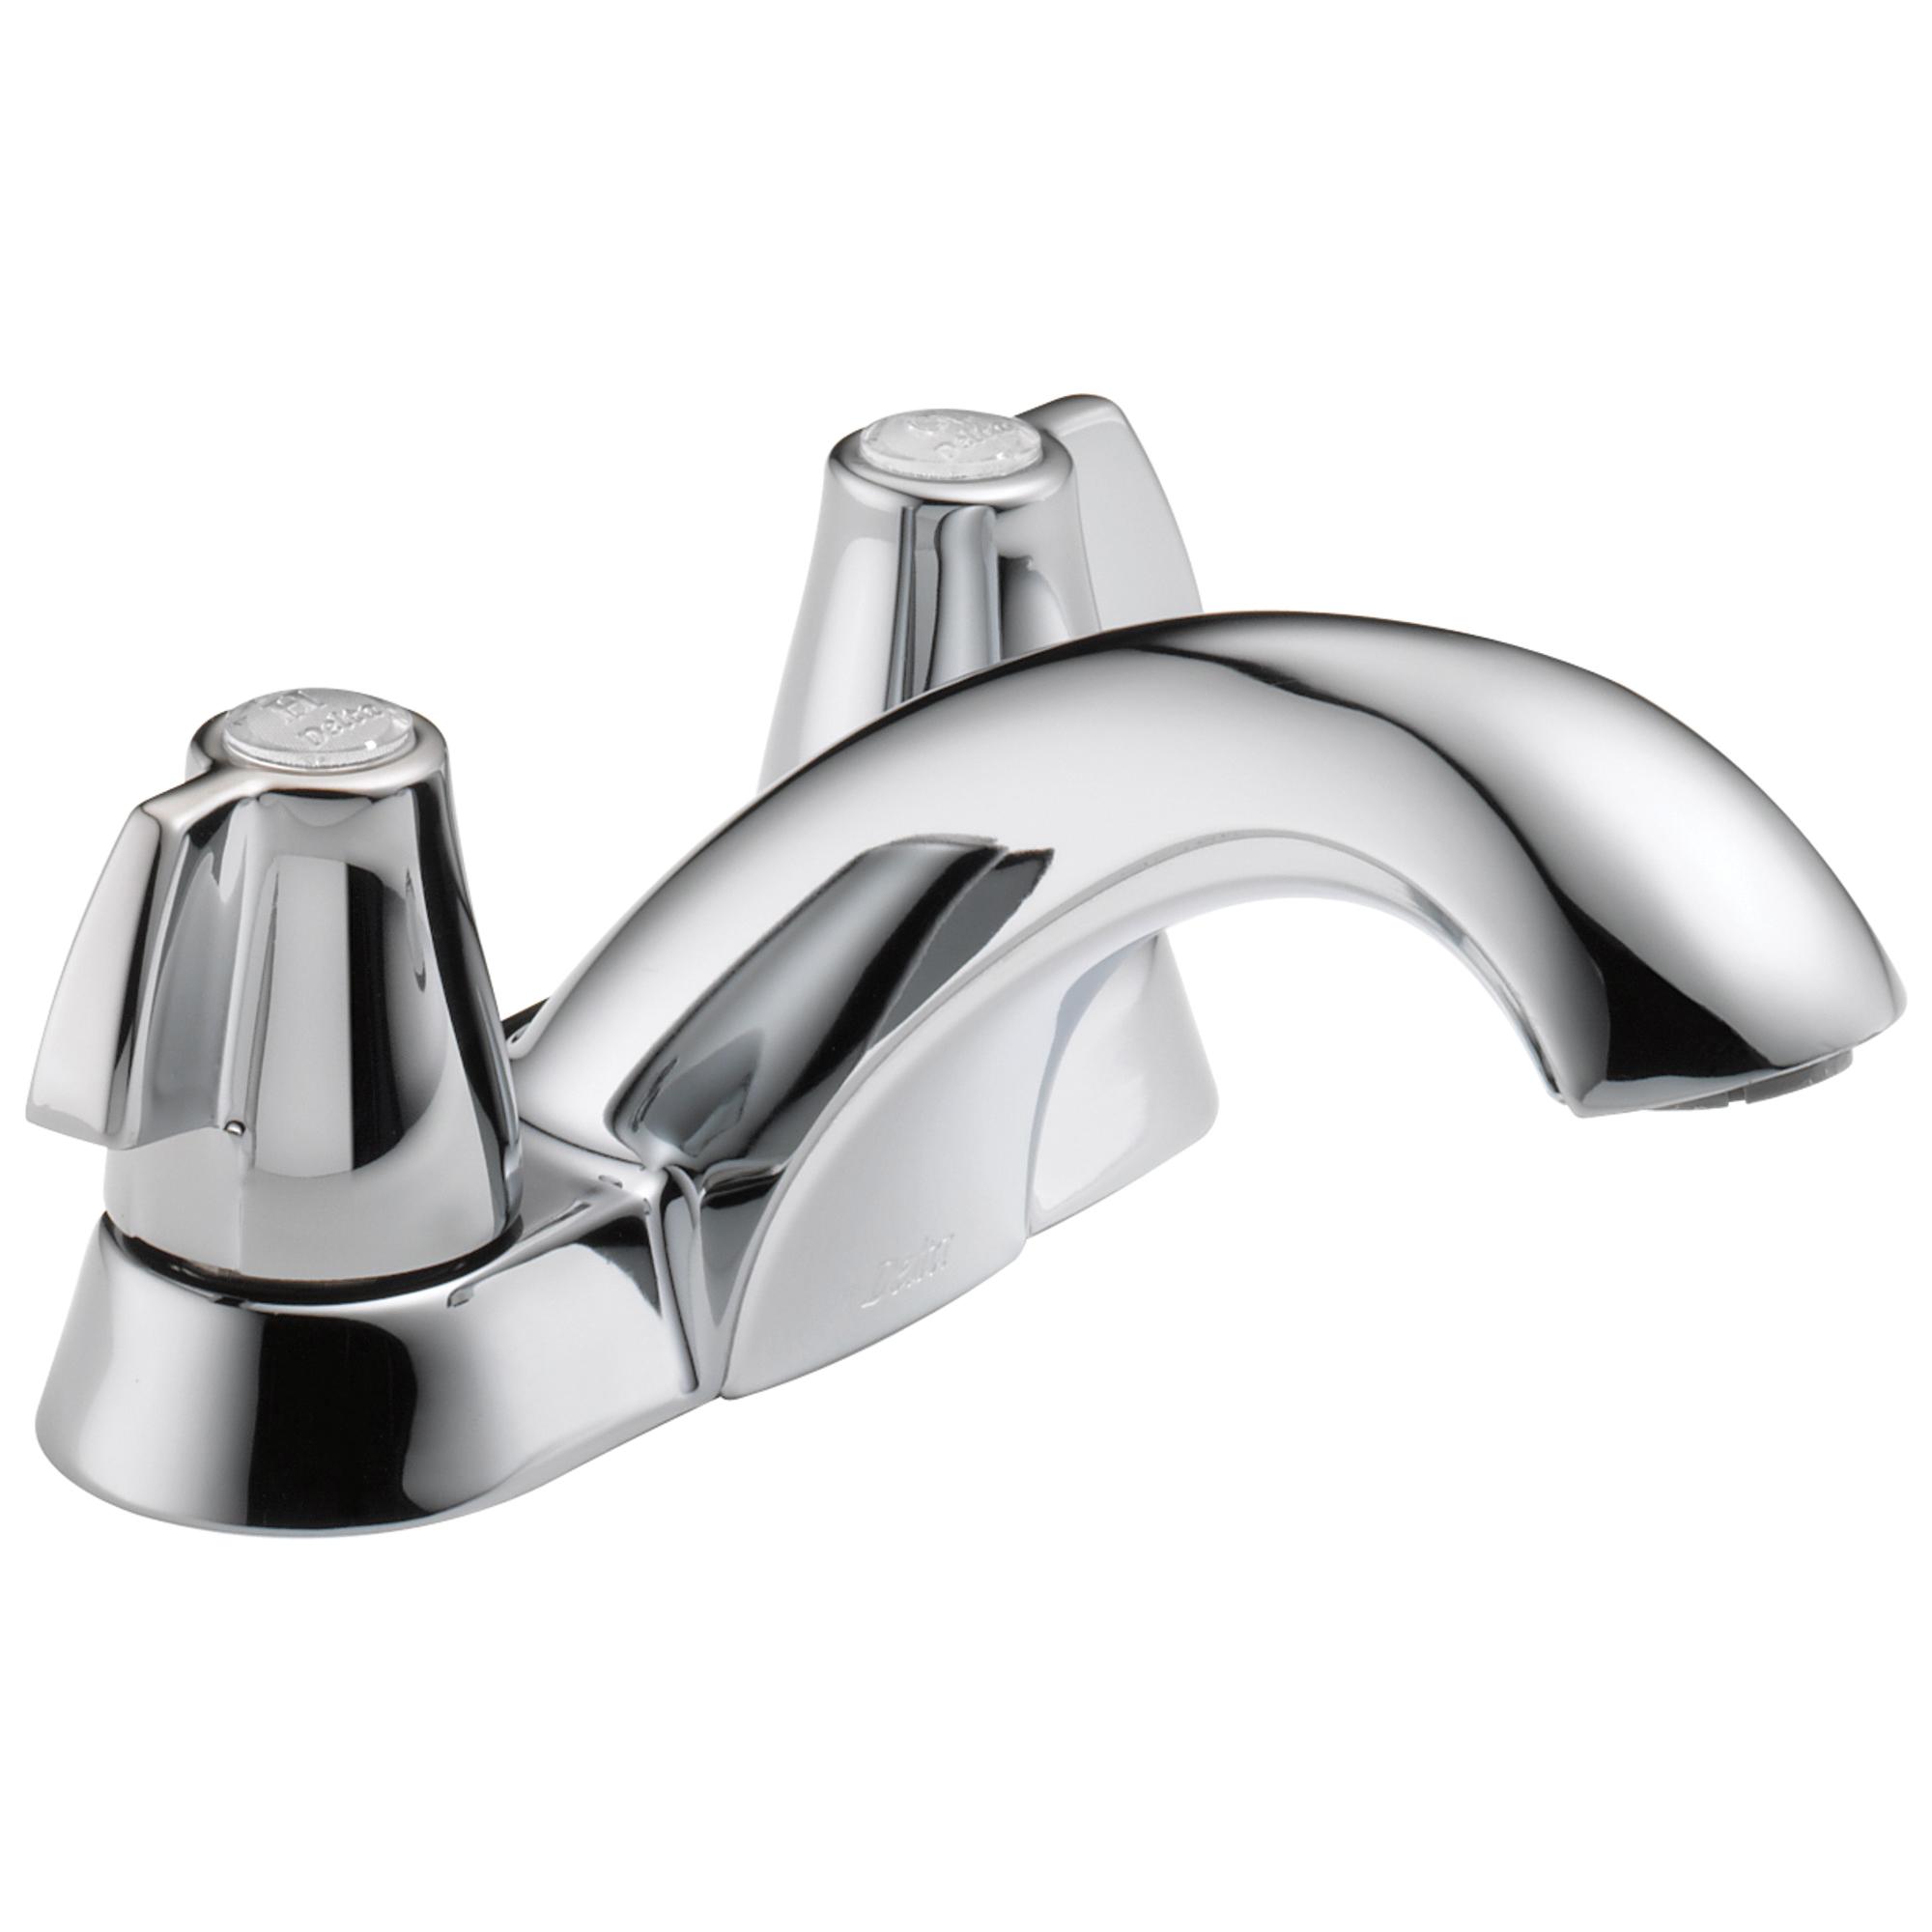 DELTA® 2510LF Classic Centerset Lavatory Faucet, Polished Chrome, 2 Handles, 1.2 gpm Flow Rate